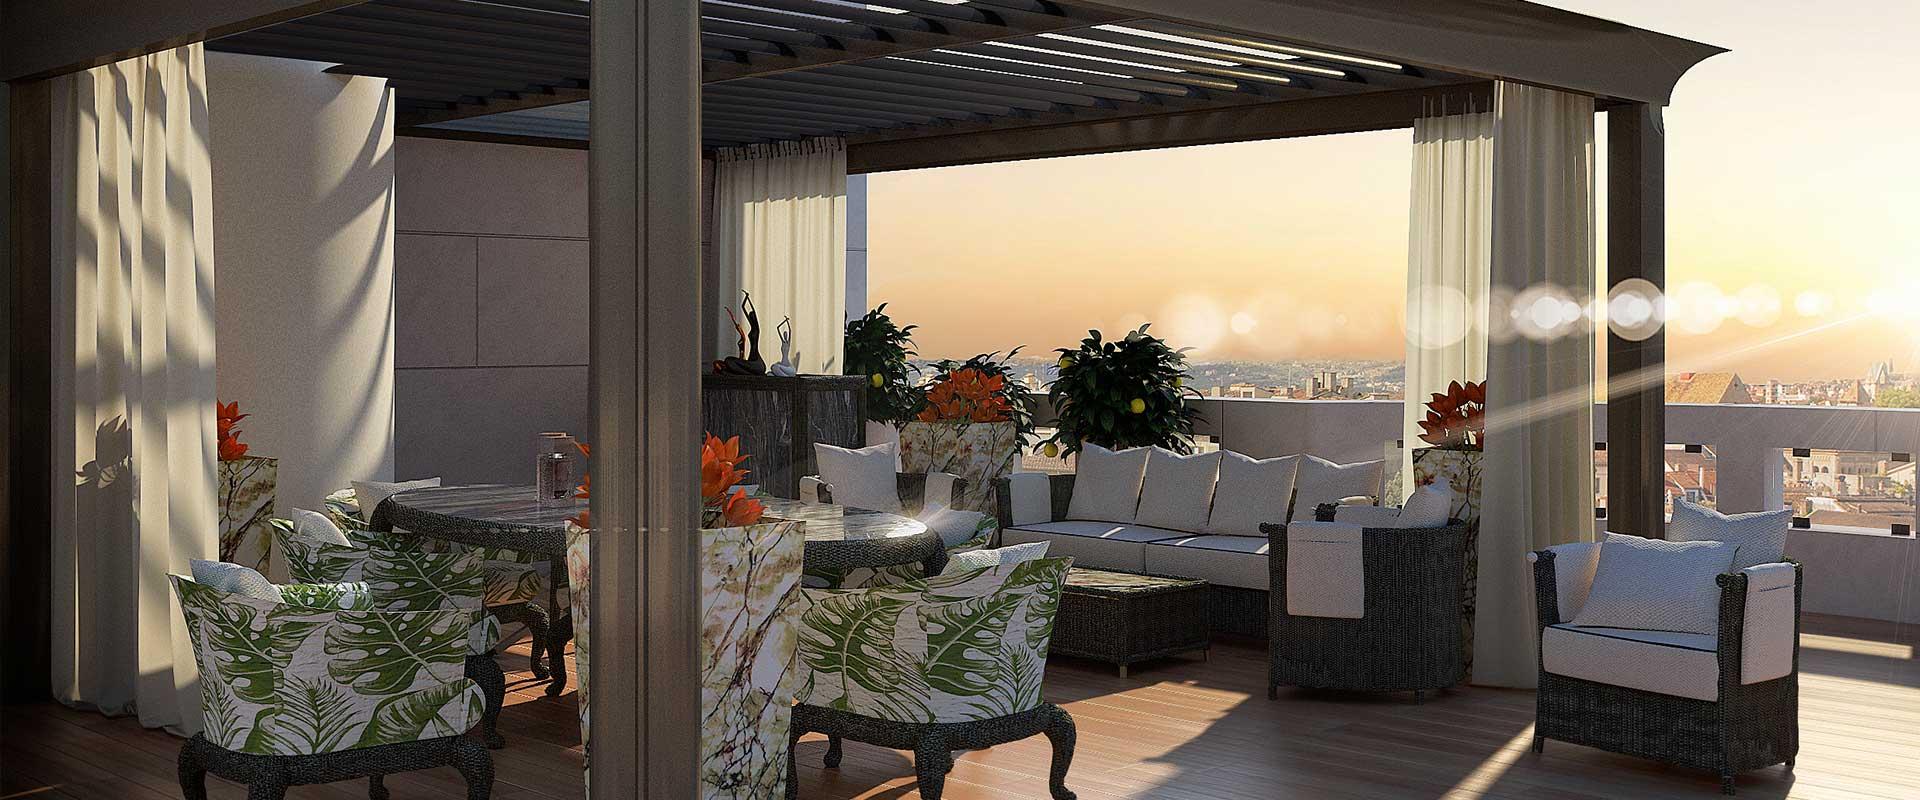 Pergola bioclimatique toit terrasse